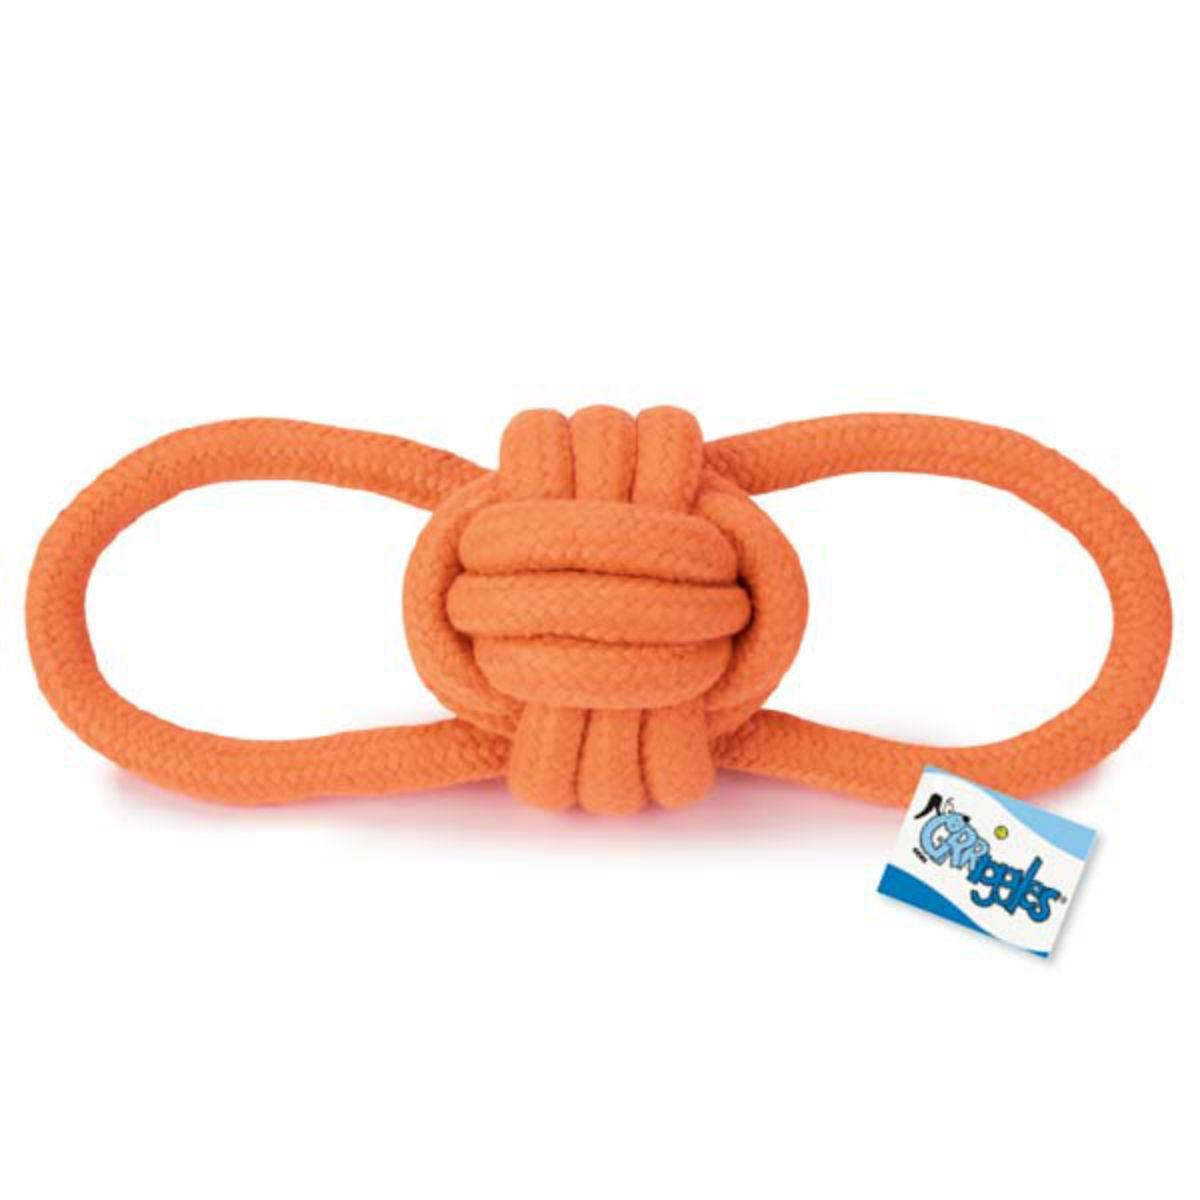 Grriggles Ruff Rope Knot Tugs Dog Toy - Orange